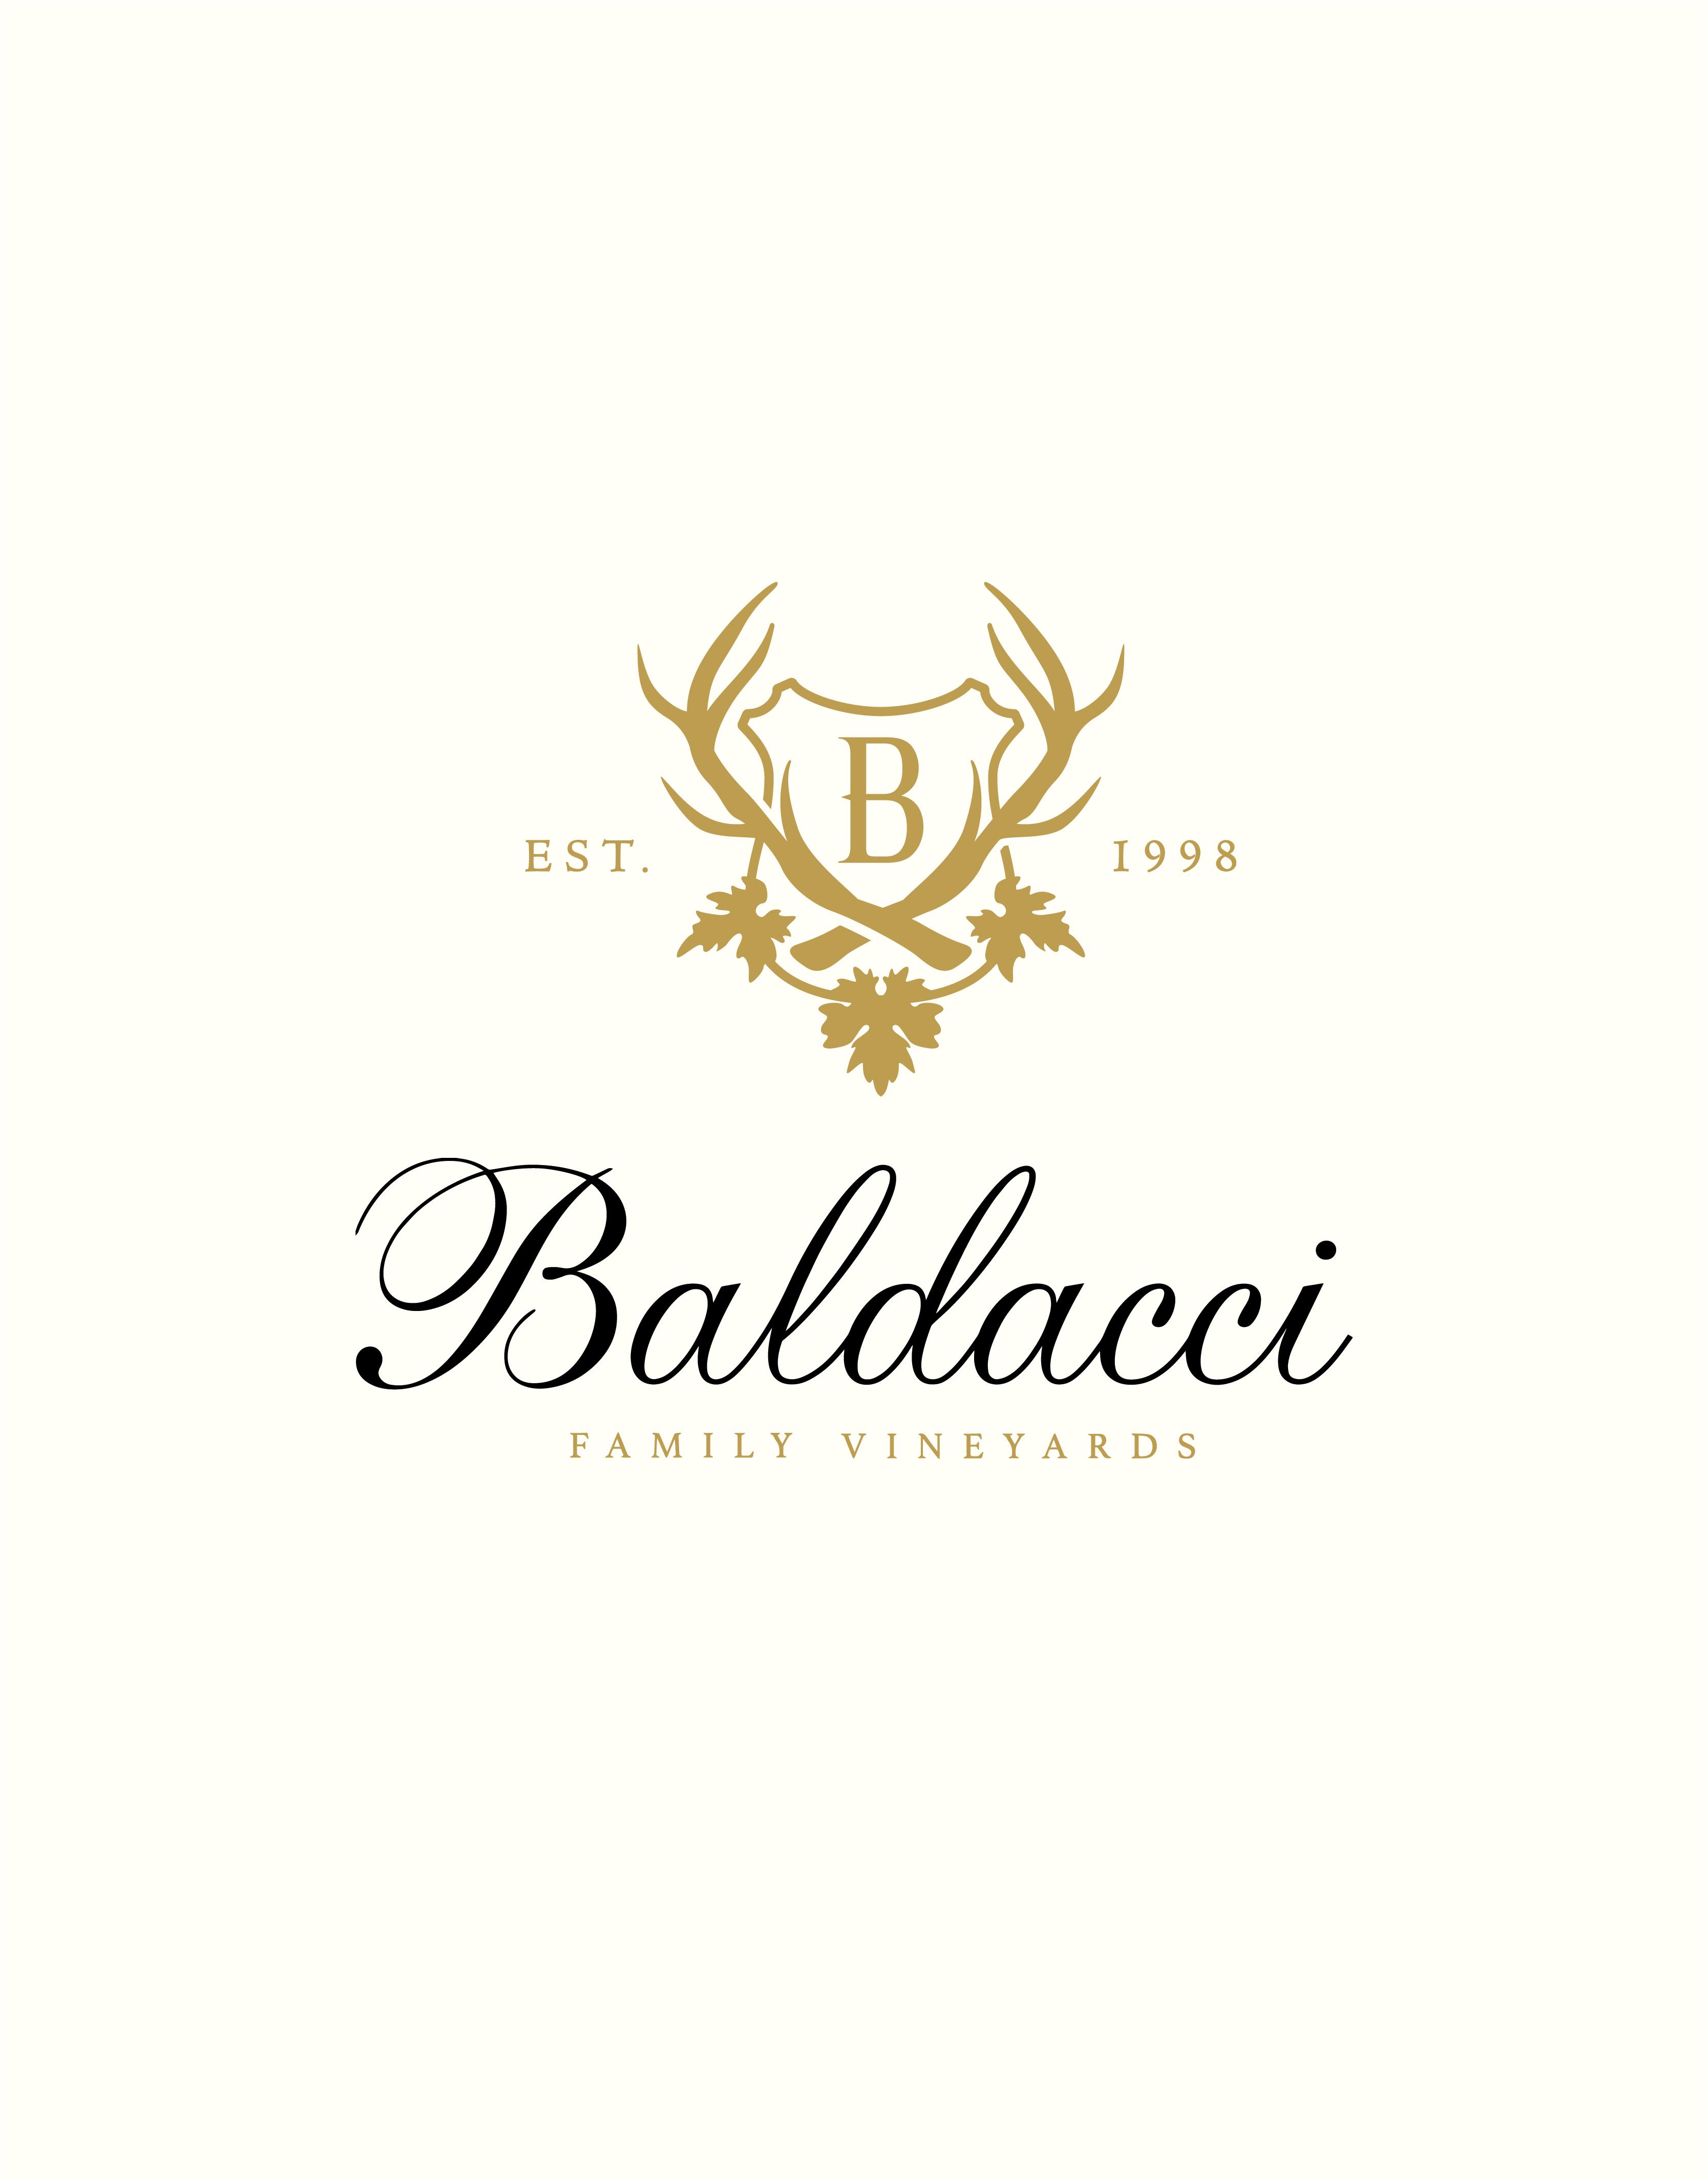 Baldacci Family Vineyards Logo Design